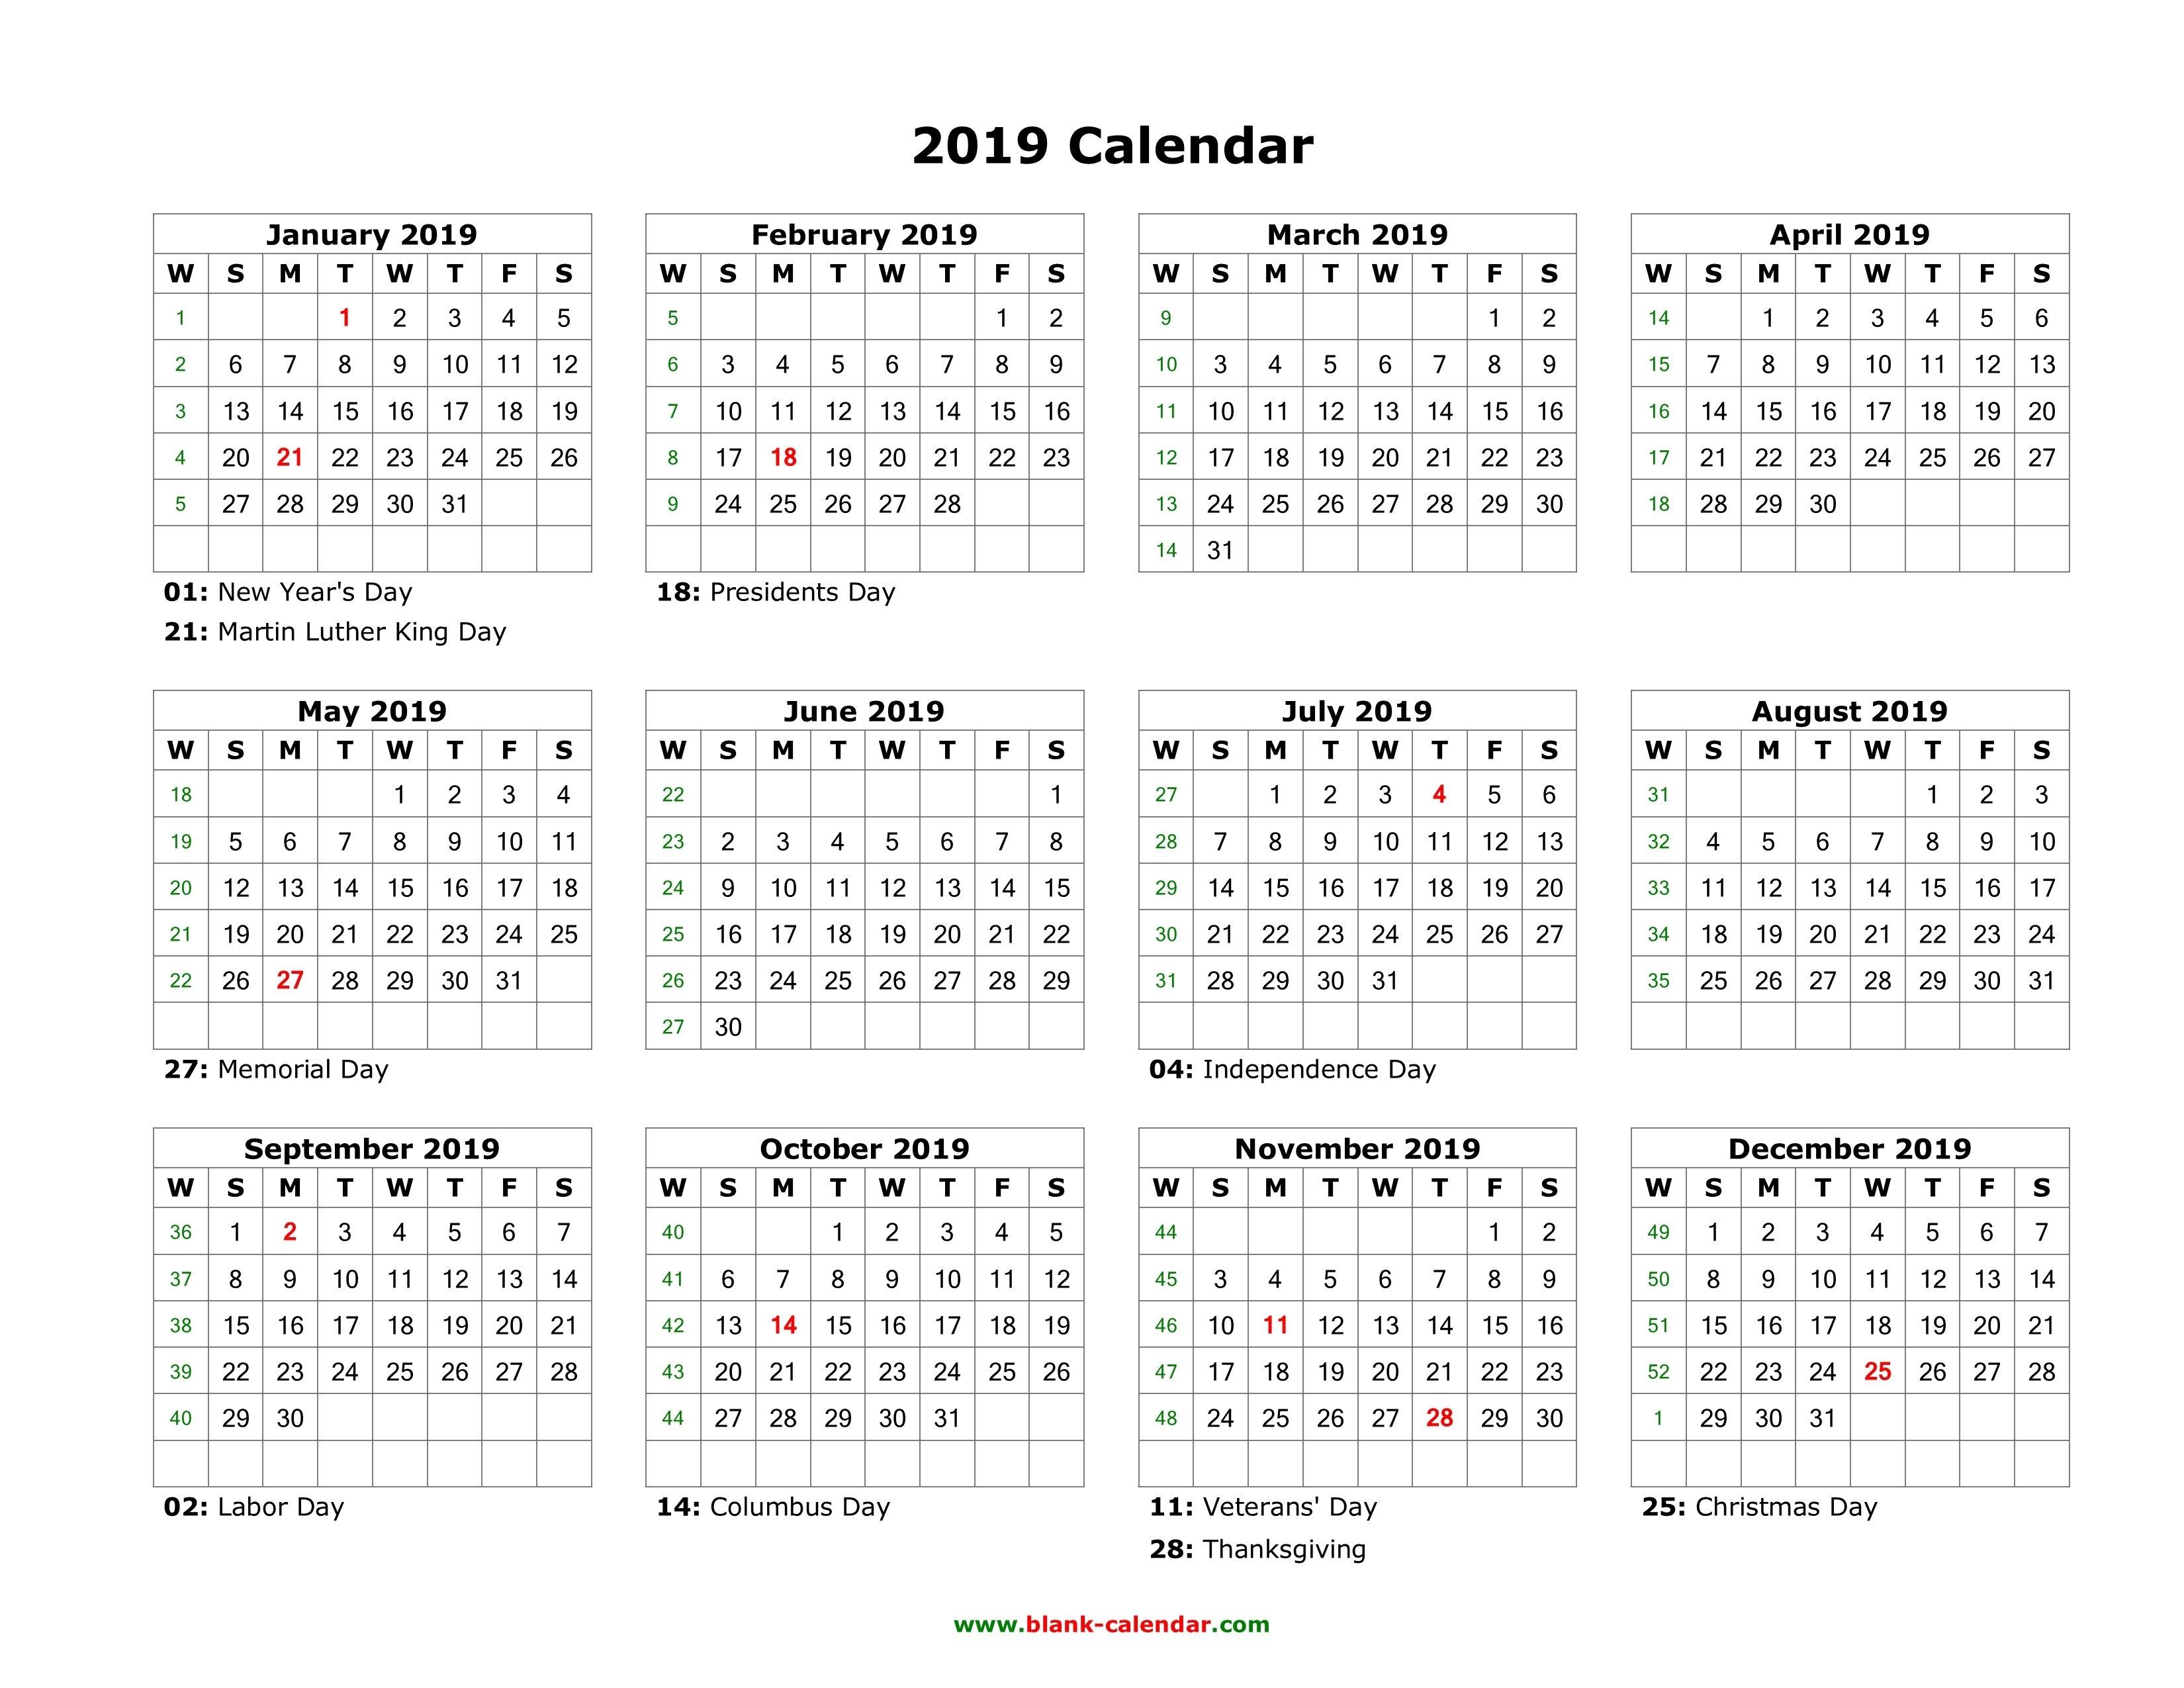 Blank Calendar 2019 | Free Download Calendar Templates Calendar 2019 Microsoft